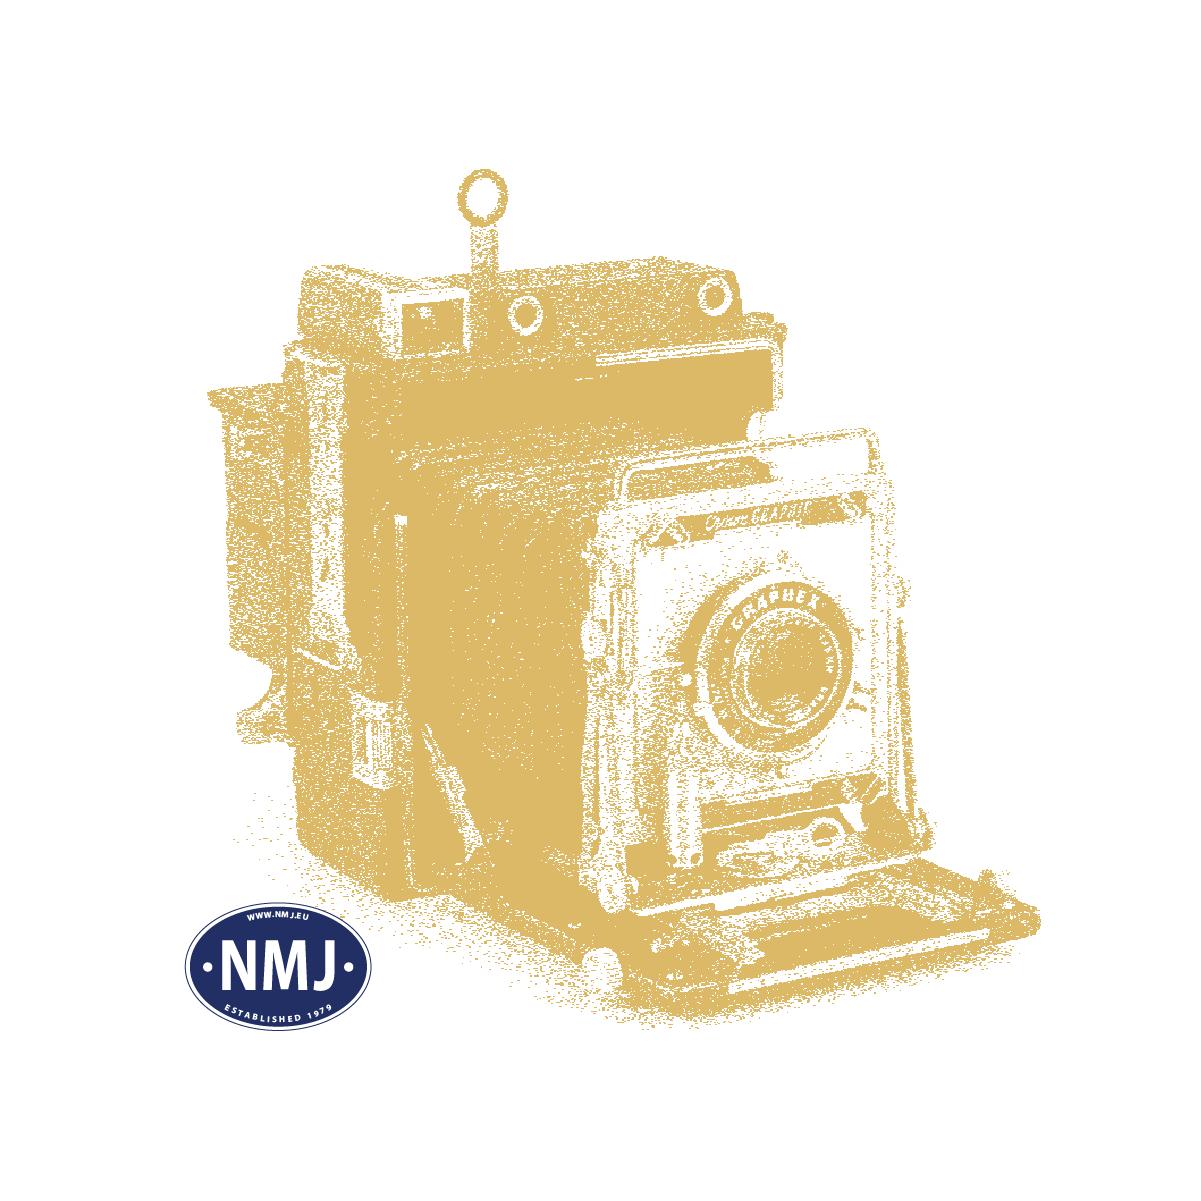 ZIMMX600R - MX600R Digitaldekoder, NEM 652 plugg, DCC / MM, 25 x 11 x 2 mm, 4 Funksjonsutganger, Railcom